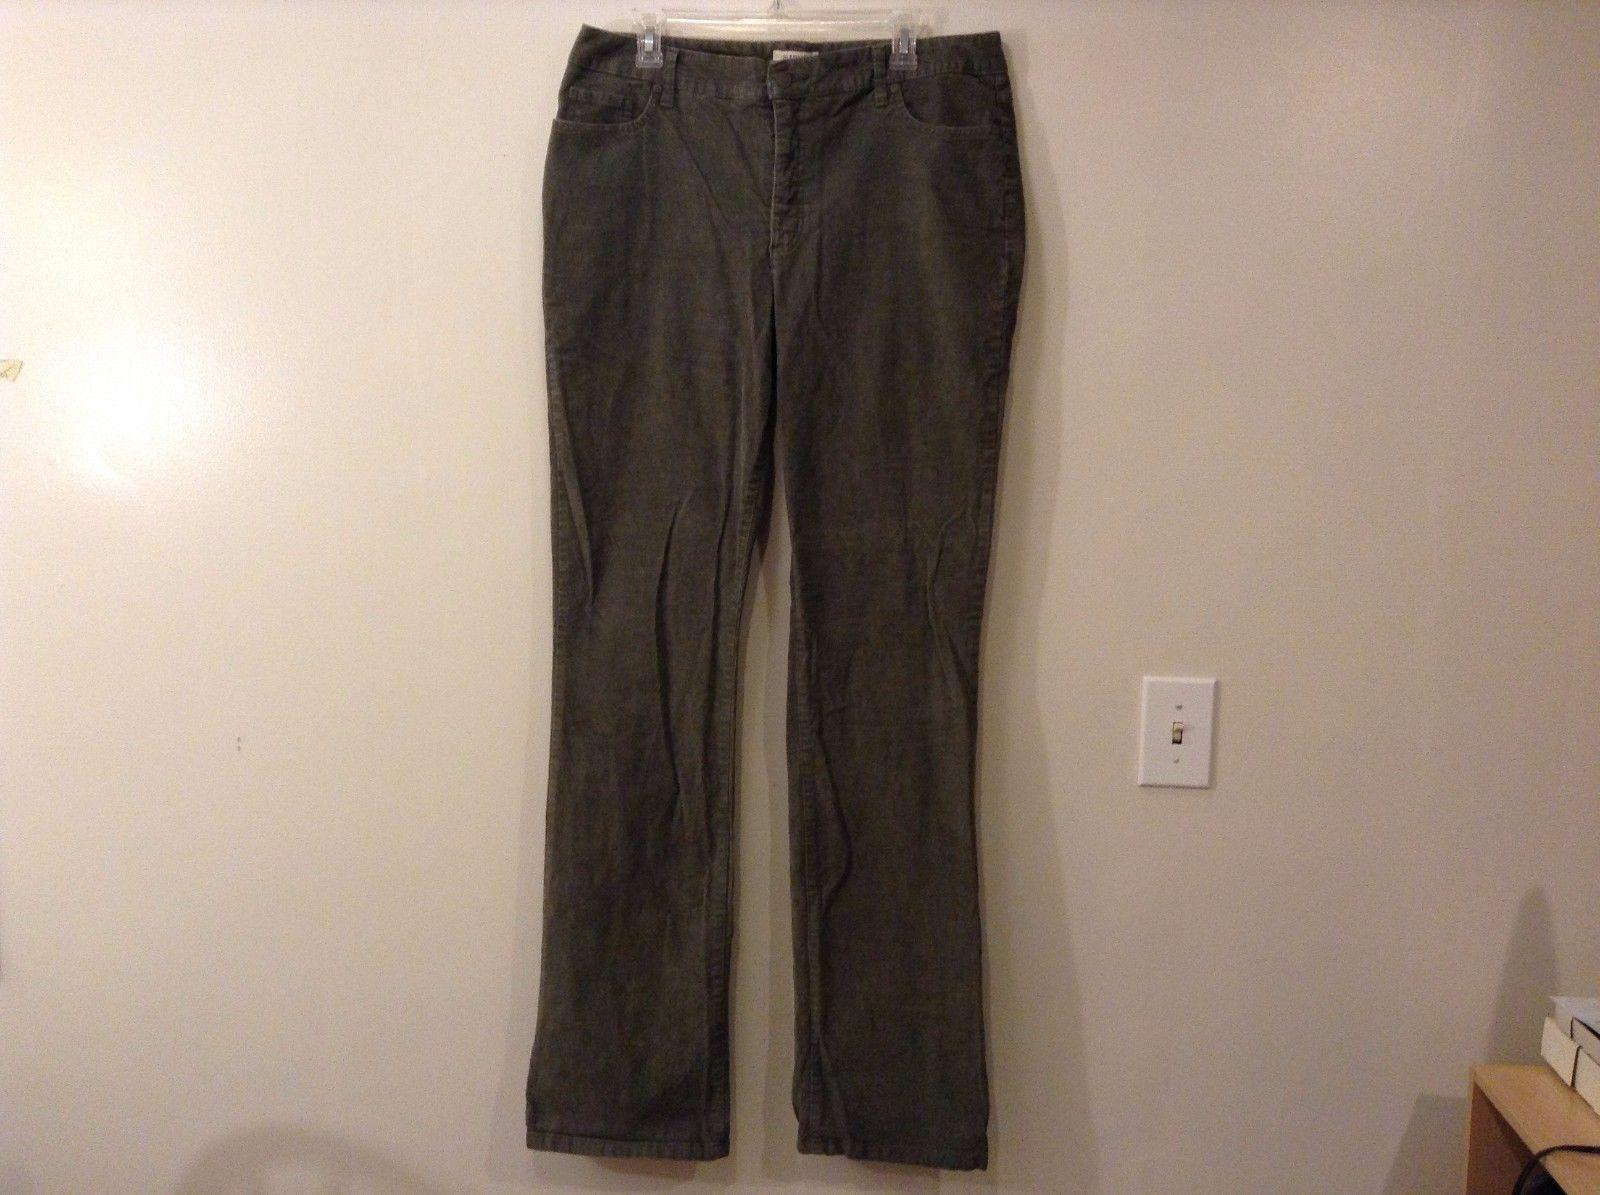 Ladies St. John's Bay Straight Fit Secretly Sender Boot Cut Corduroy Pants 16